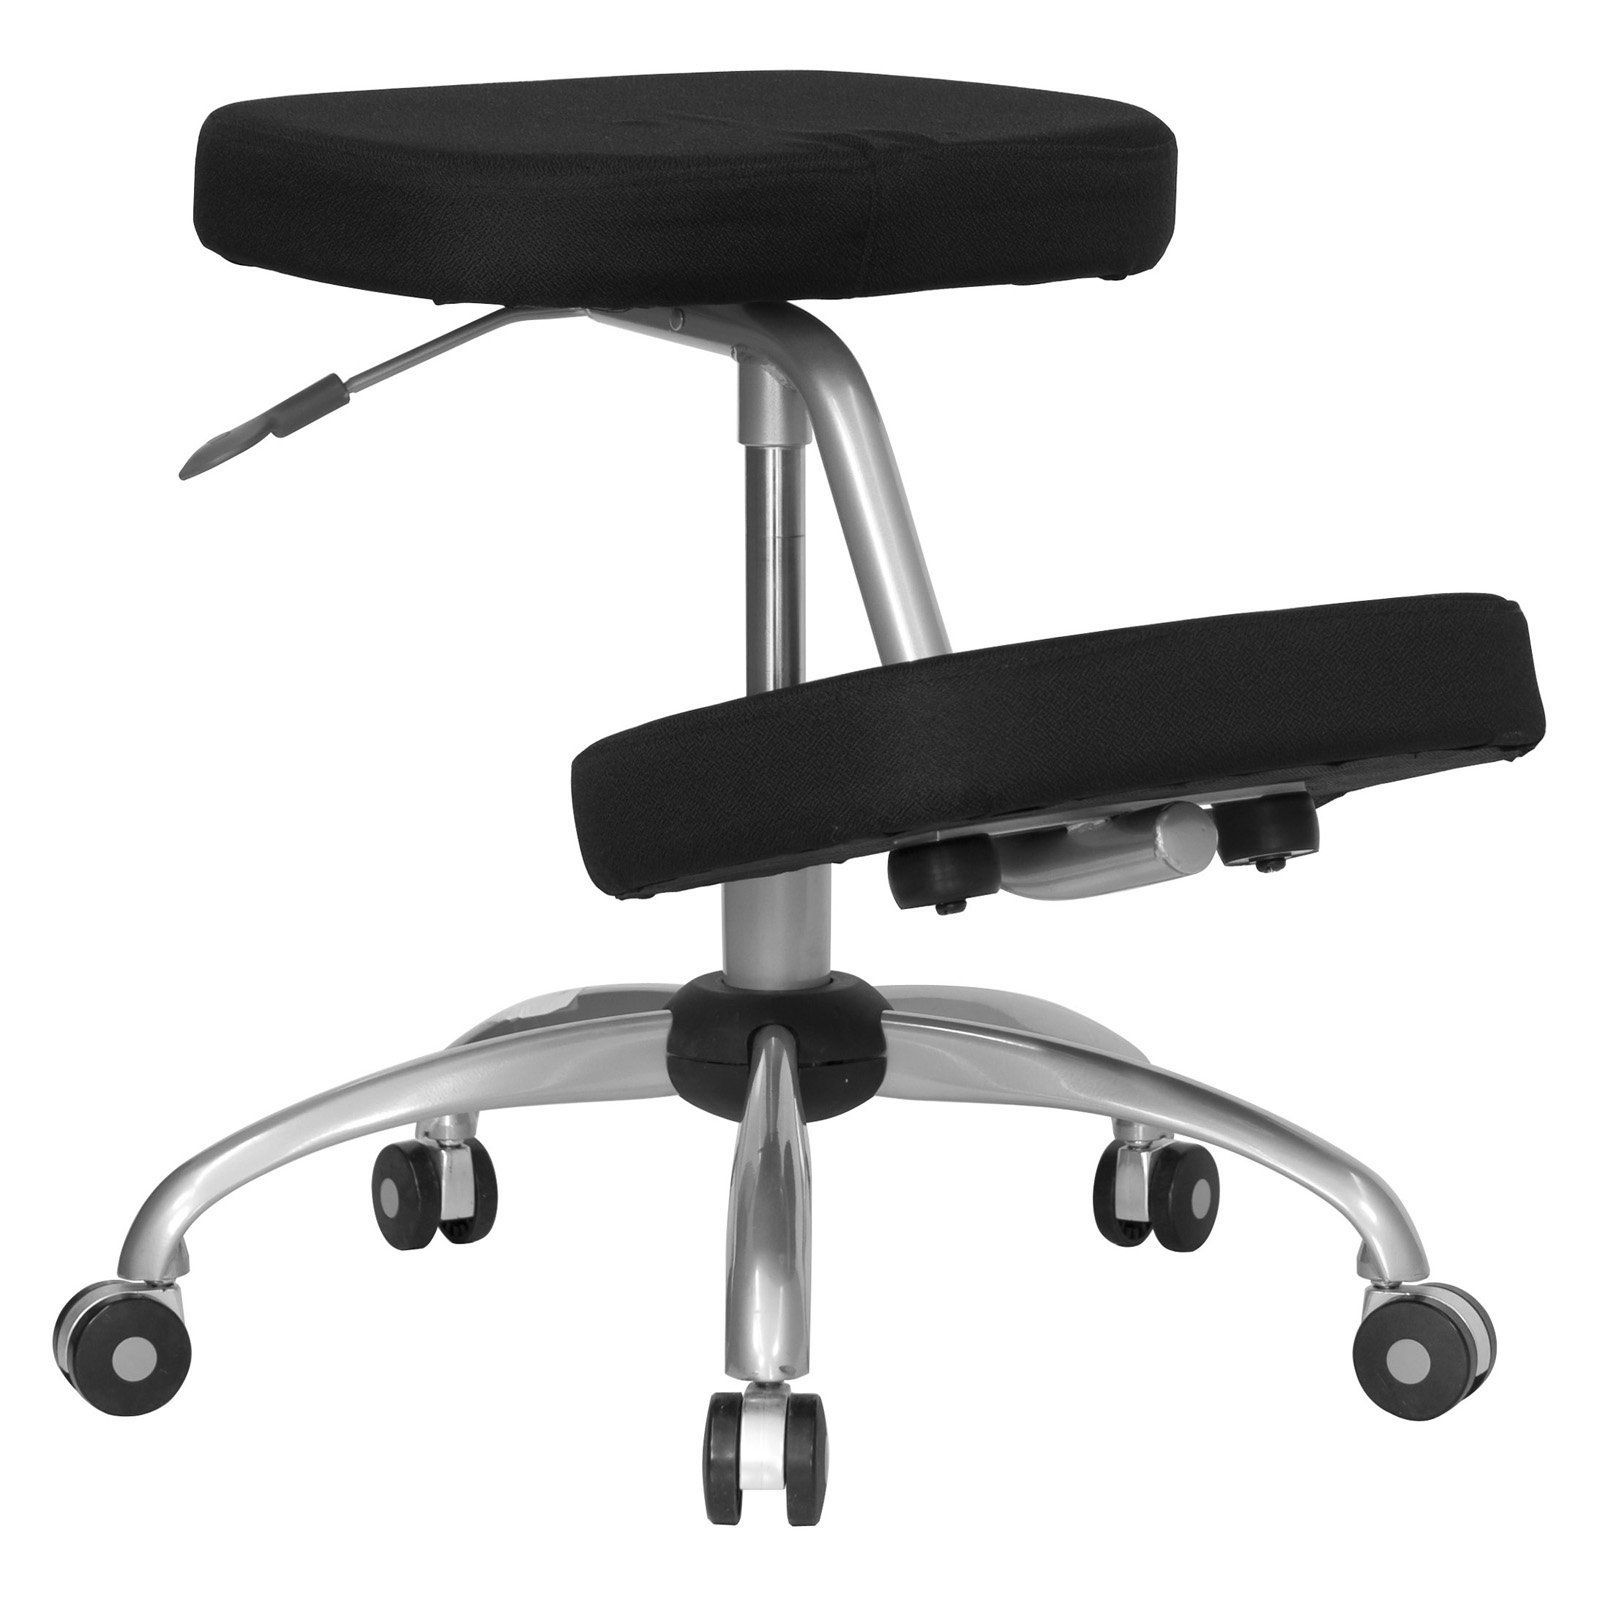 Flash Furniture Ergonomic Kneeling Posture fice Chair Black